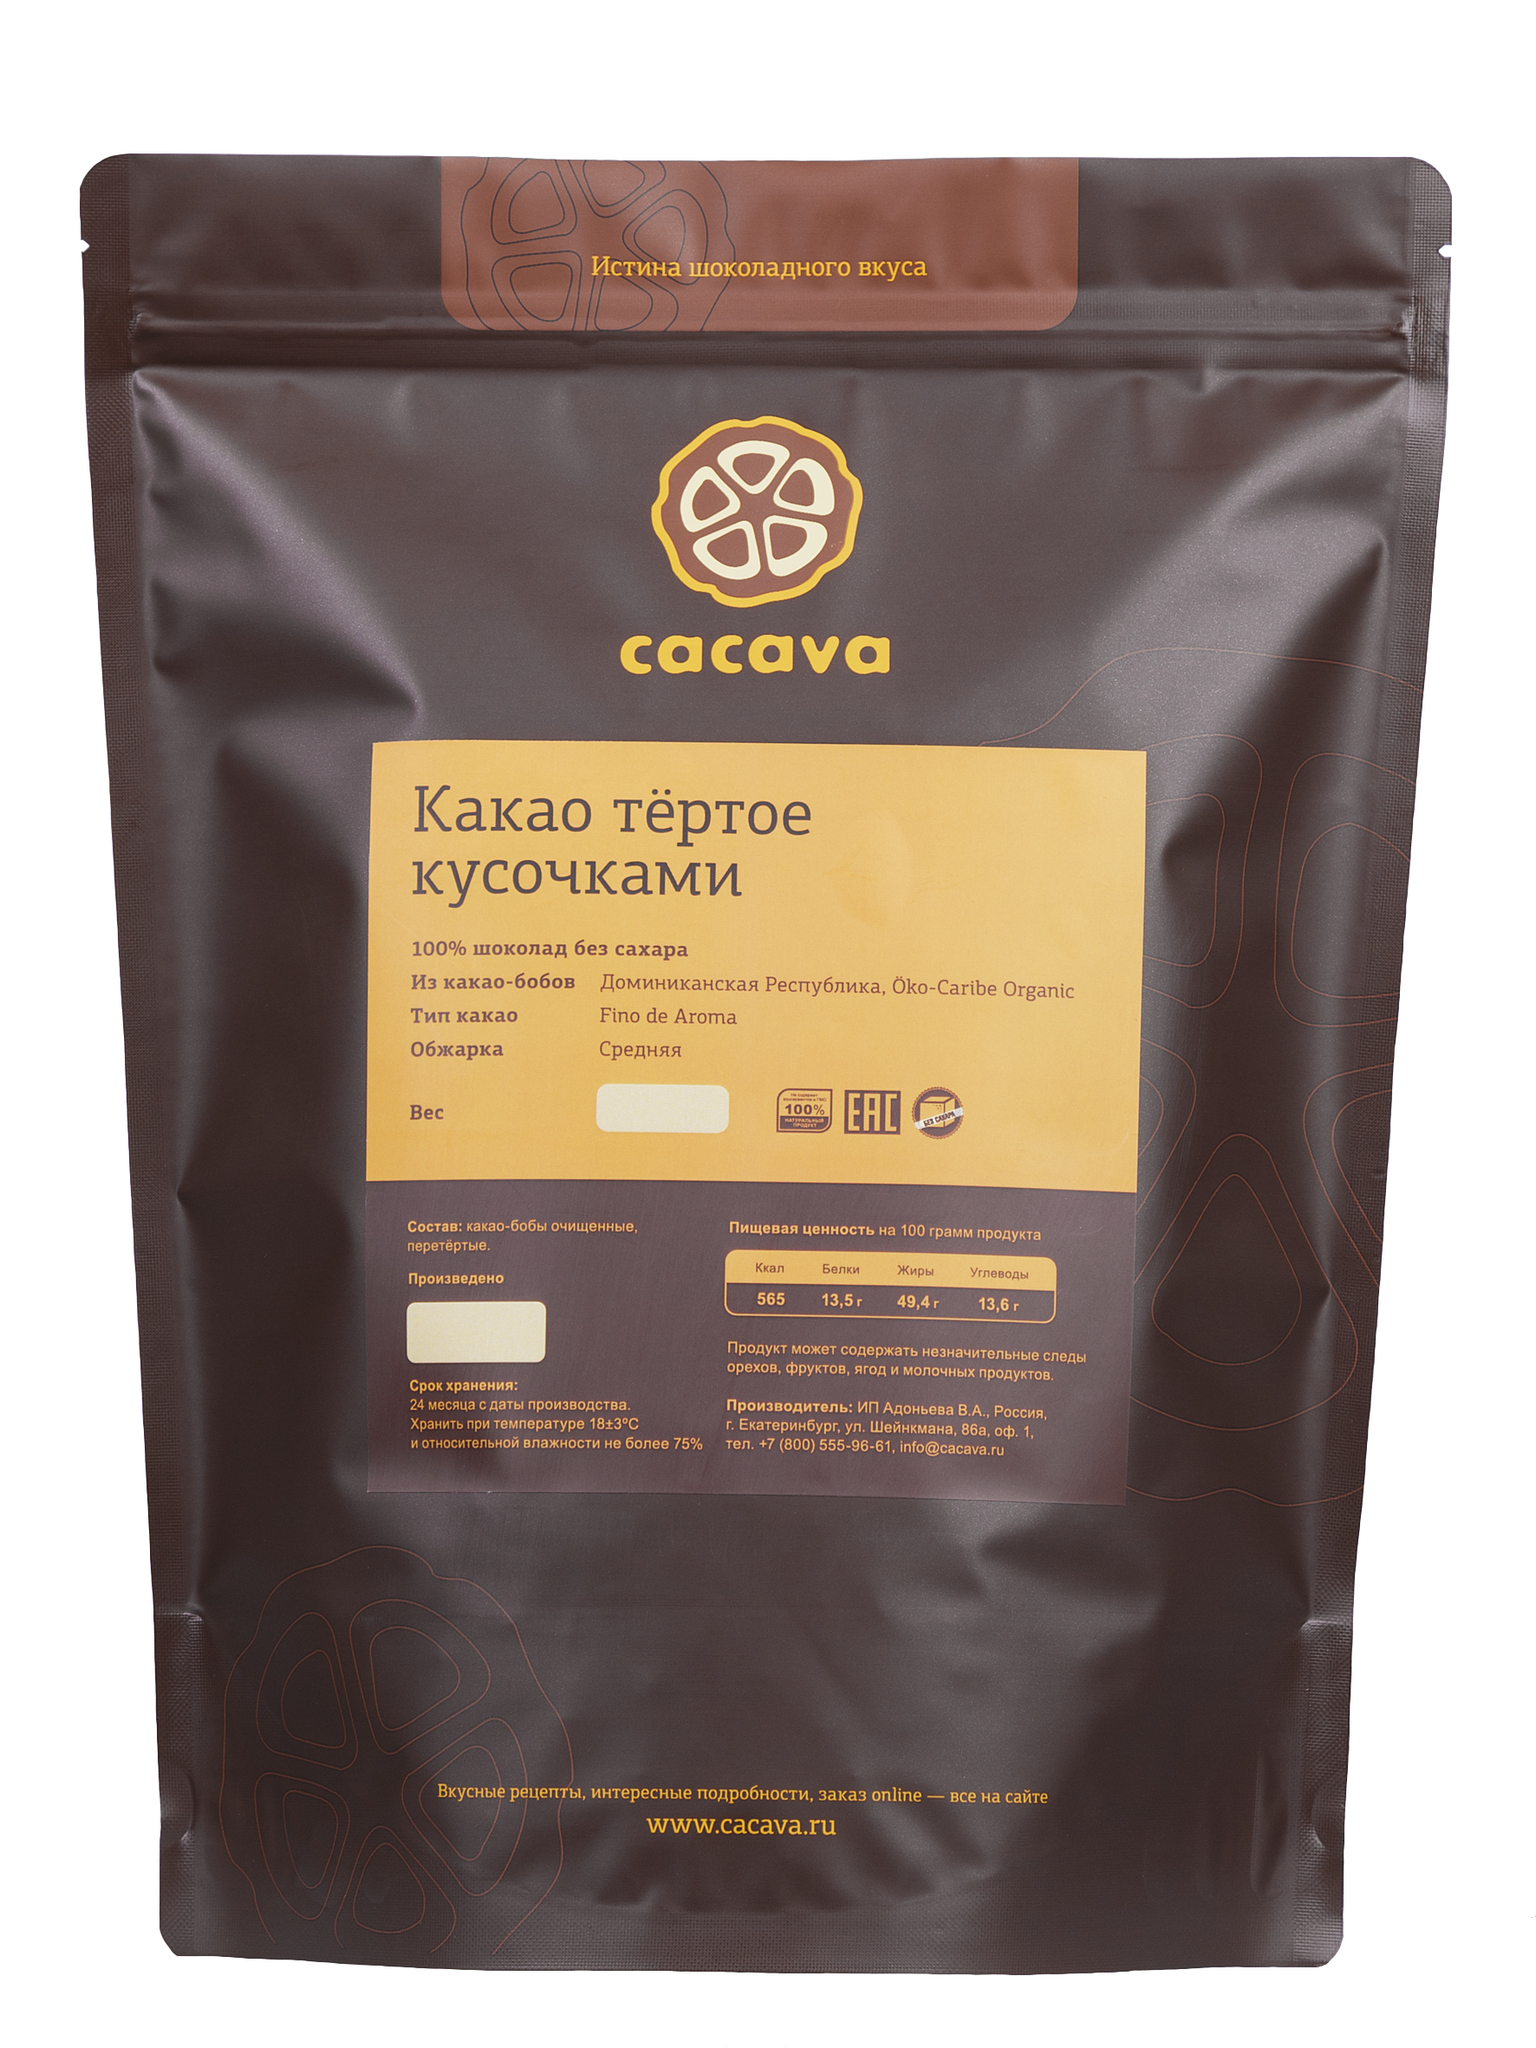 Какао тёртое кусочками (Доминикана, ÖKO CARIBE), упаковка 1 кг